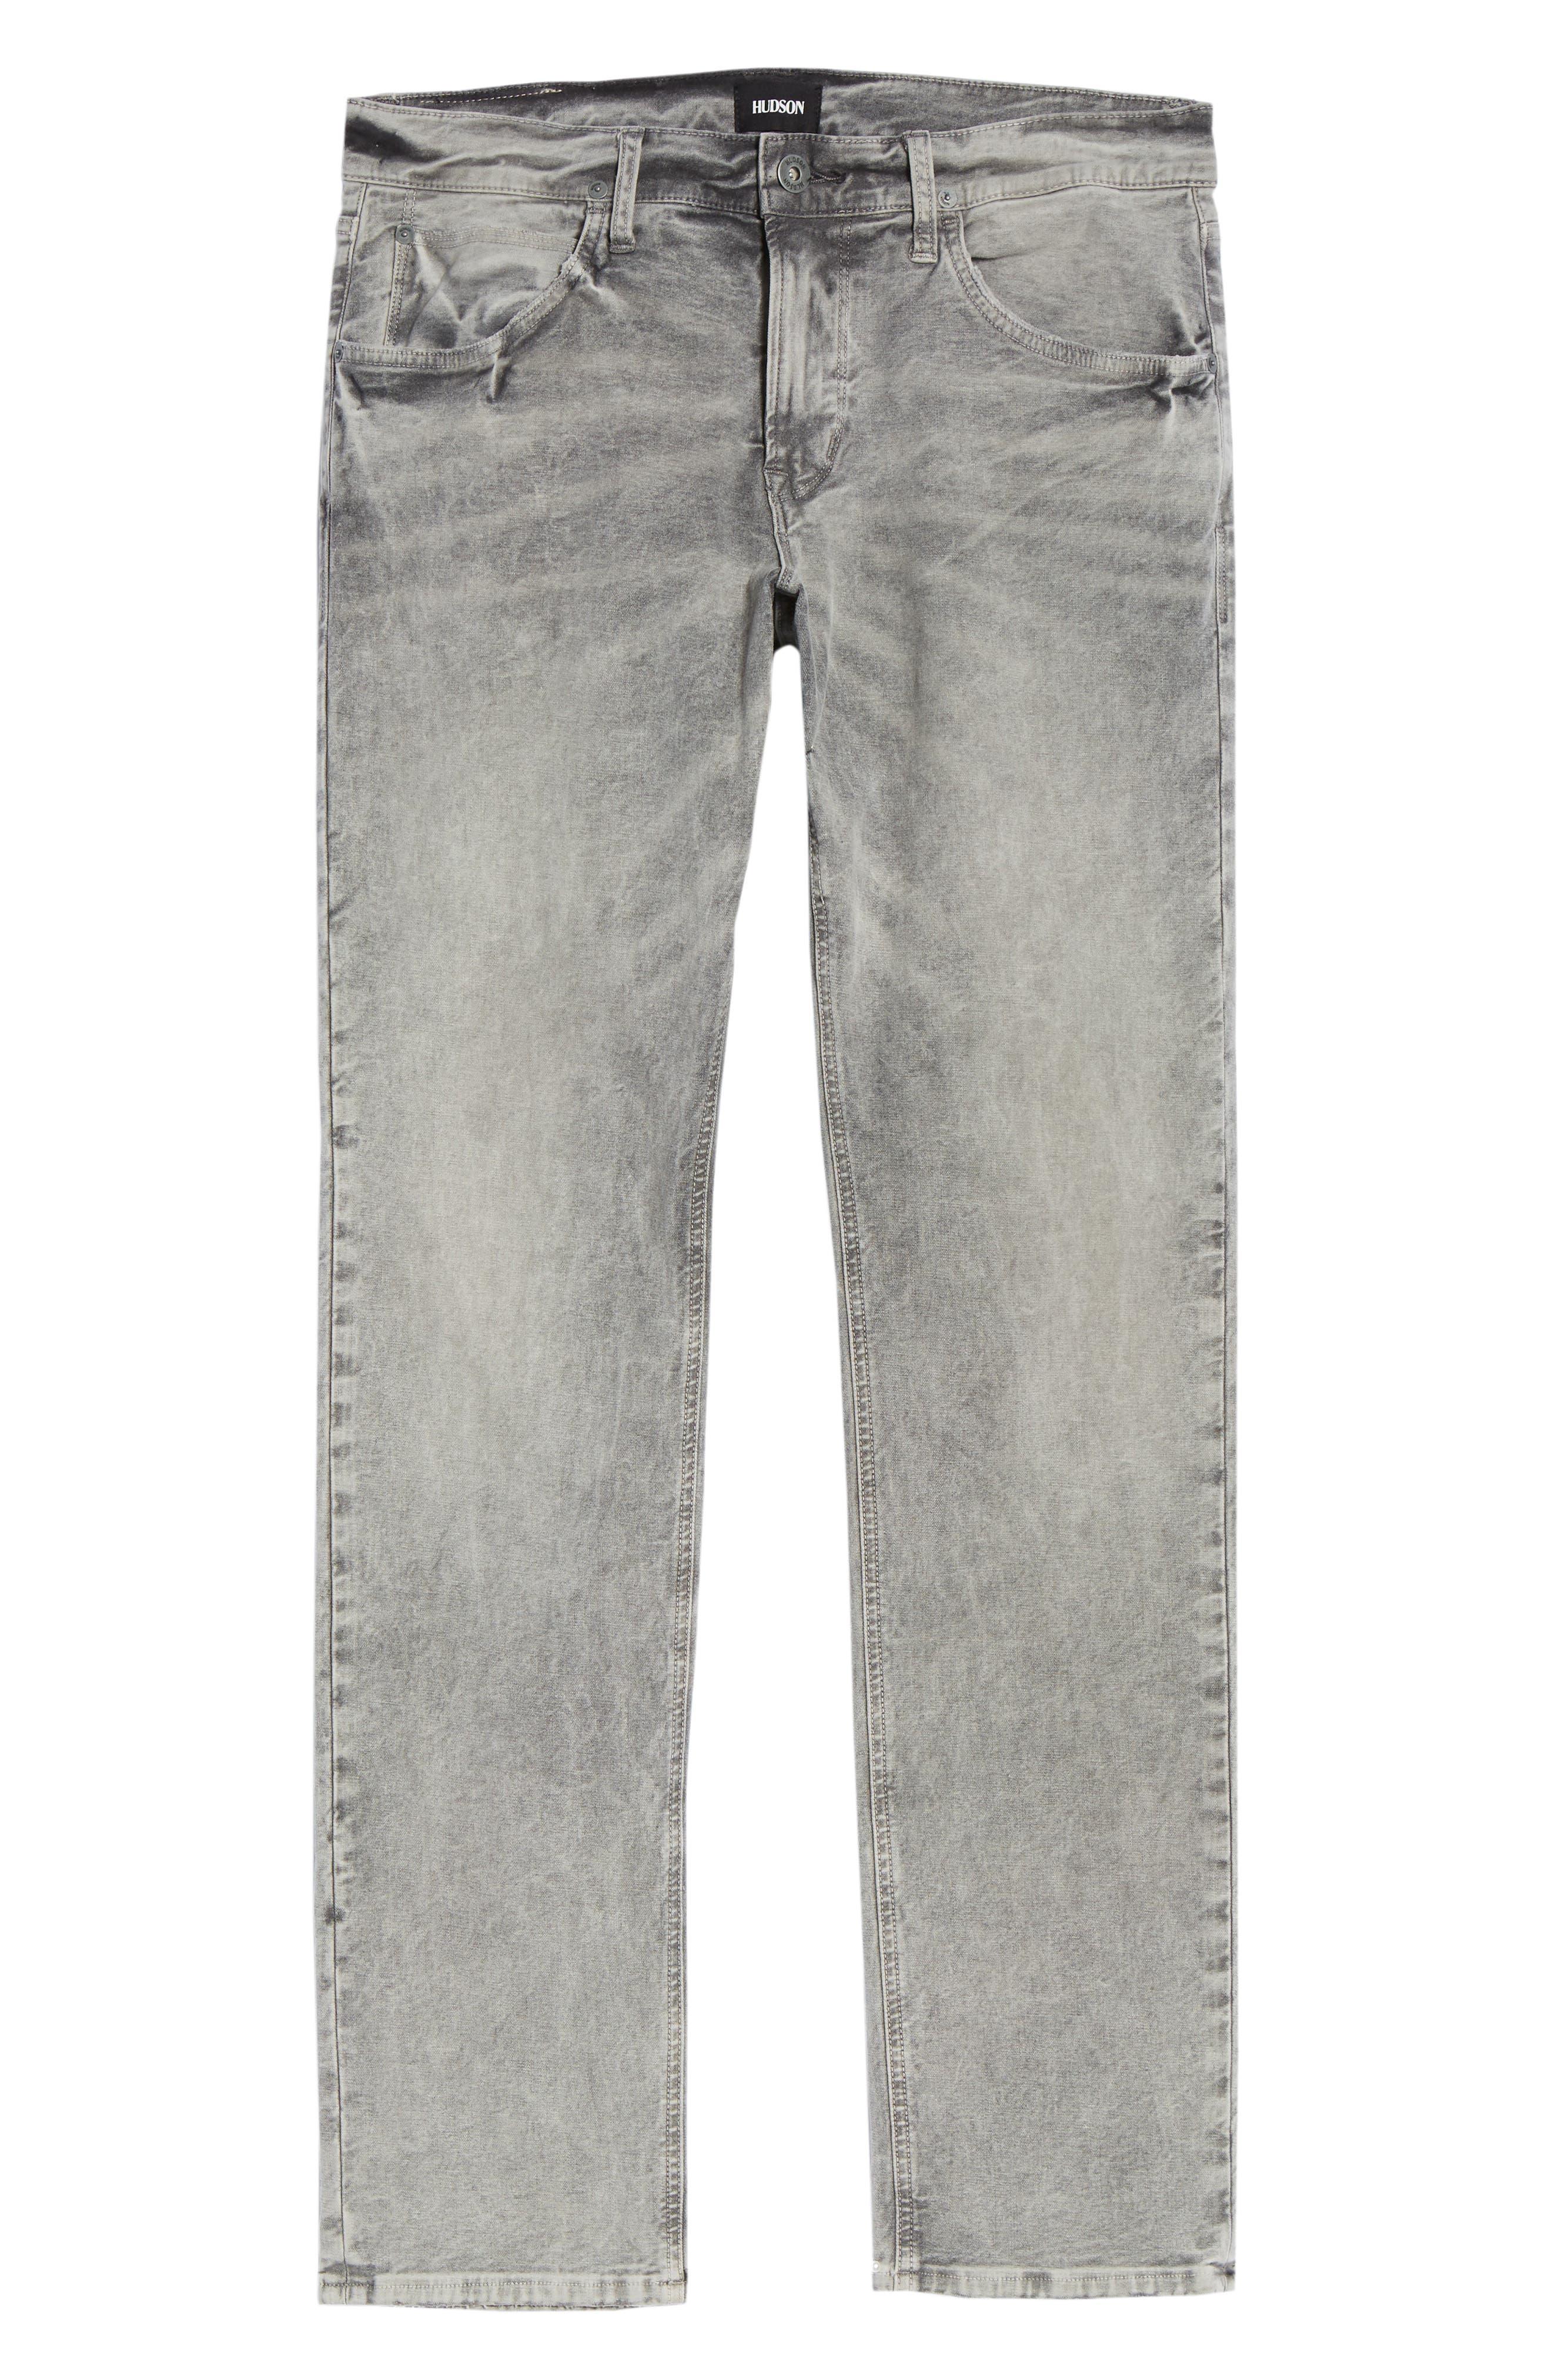 Blake Slim Fit Jeans,                             Alternate thumbnail 6, color,                             Deceiving